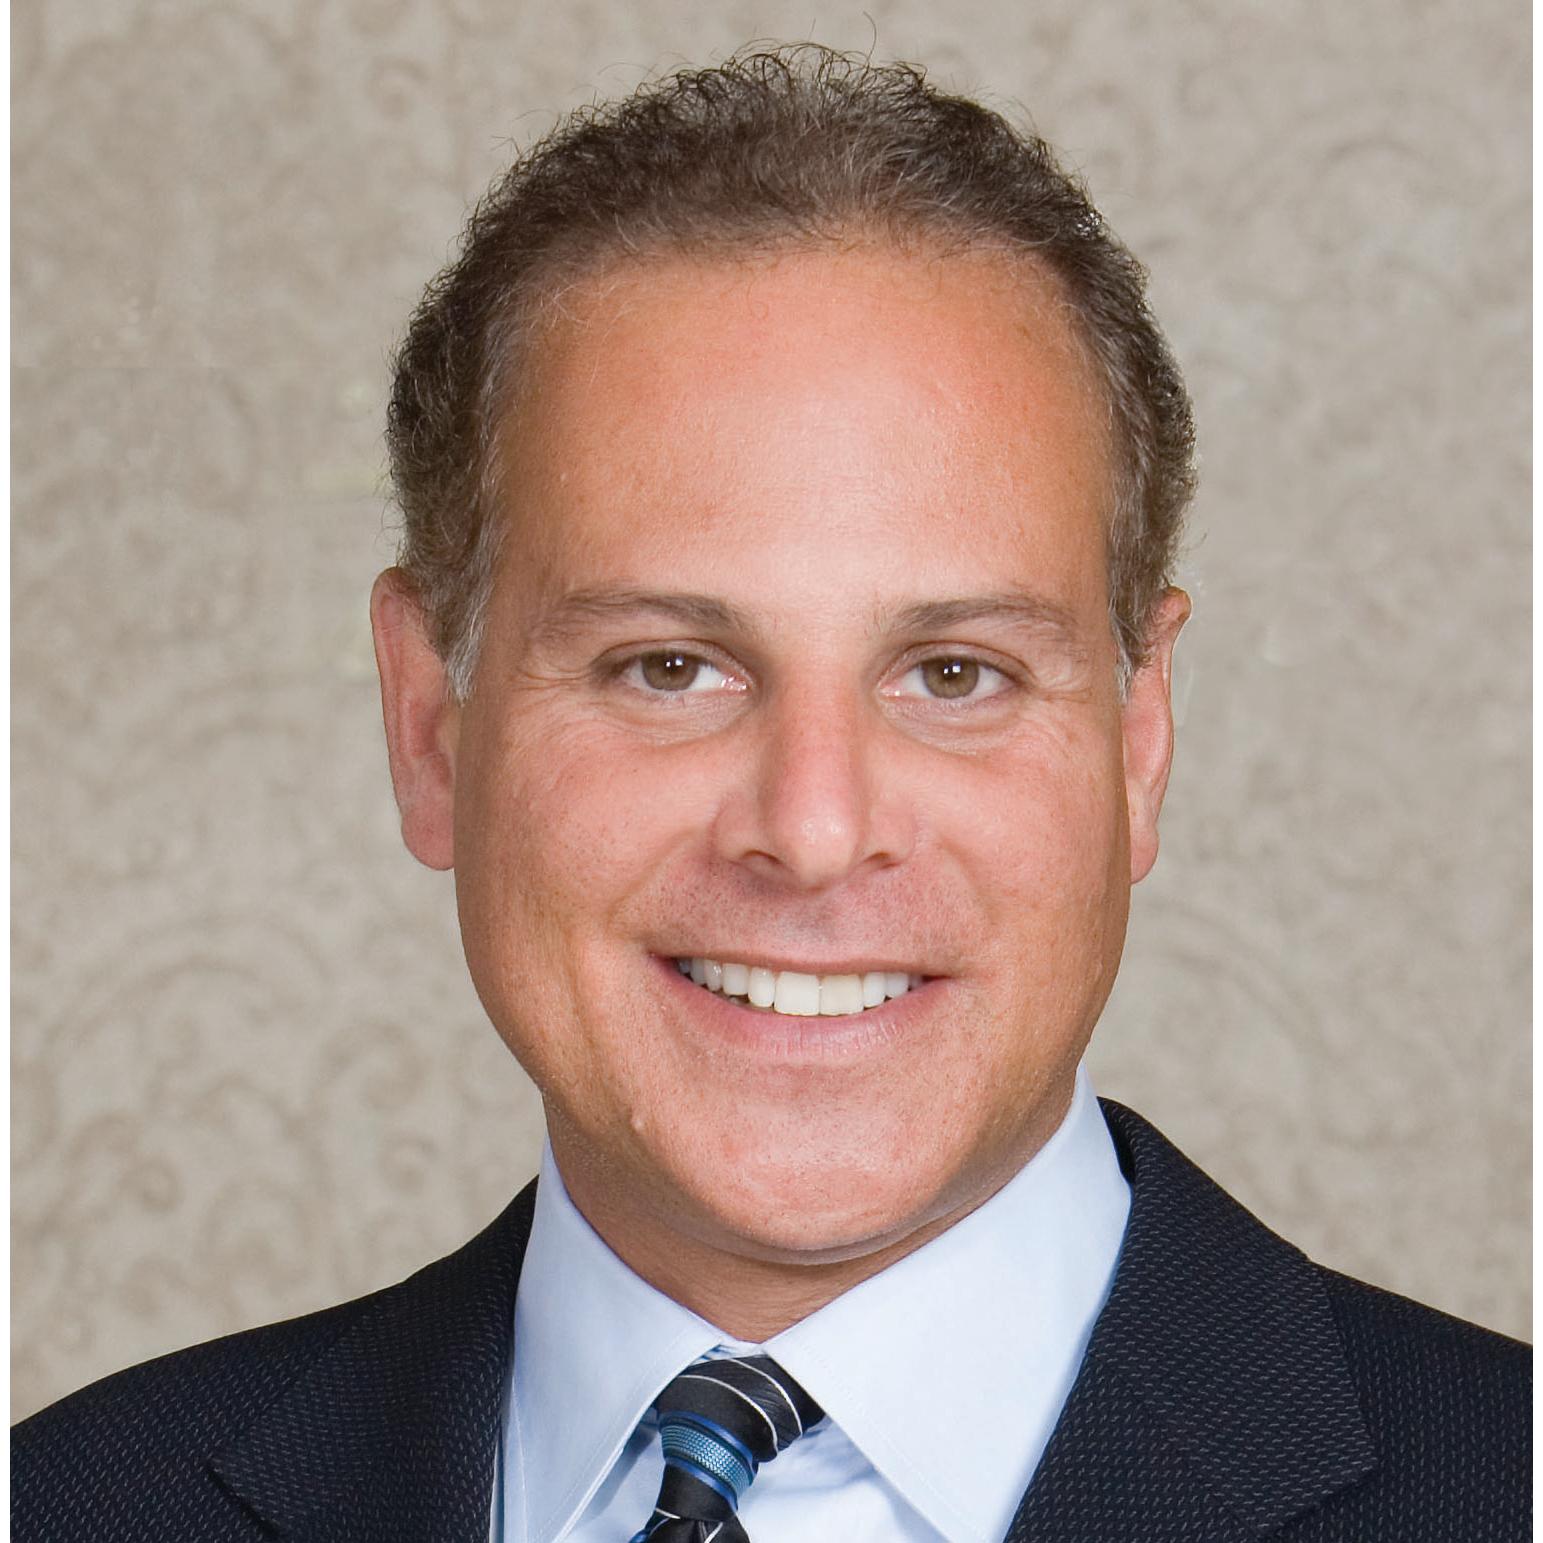 Stephen T. Greenberg, MD: Stephen T Greenberg, MD - Woodbury, NY 11797 - (516)364-4200 | ShowMeLocal.com